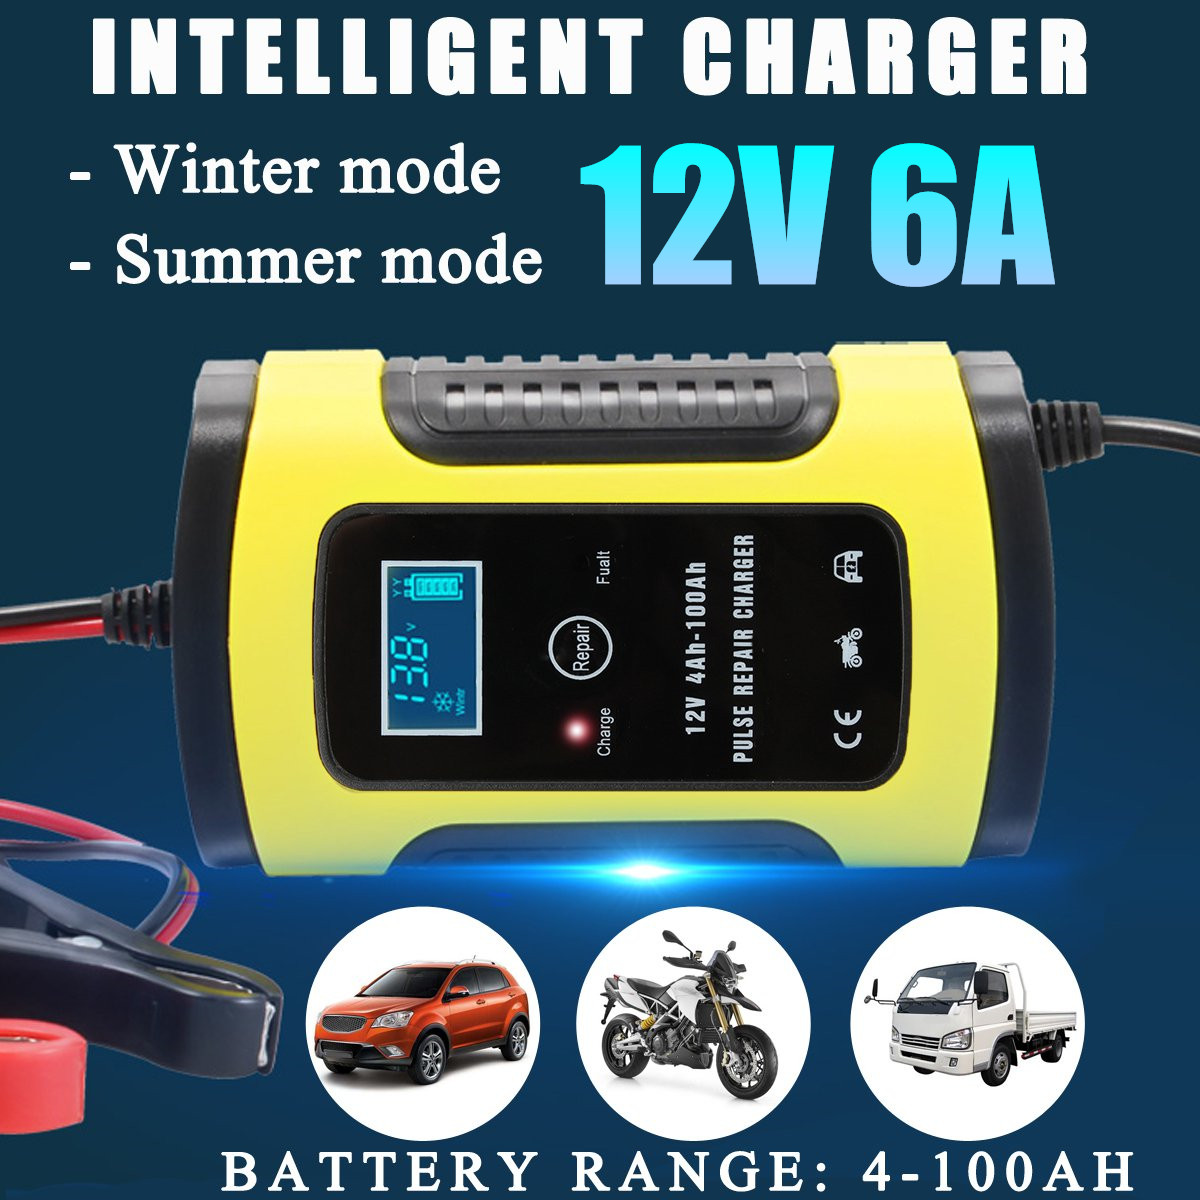 12V 6A 修理液晶バッテリー充電器スマートための高速車のオートバイの修理式鉛蓄電池 Agm Gel ウェット電池充電